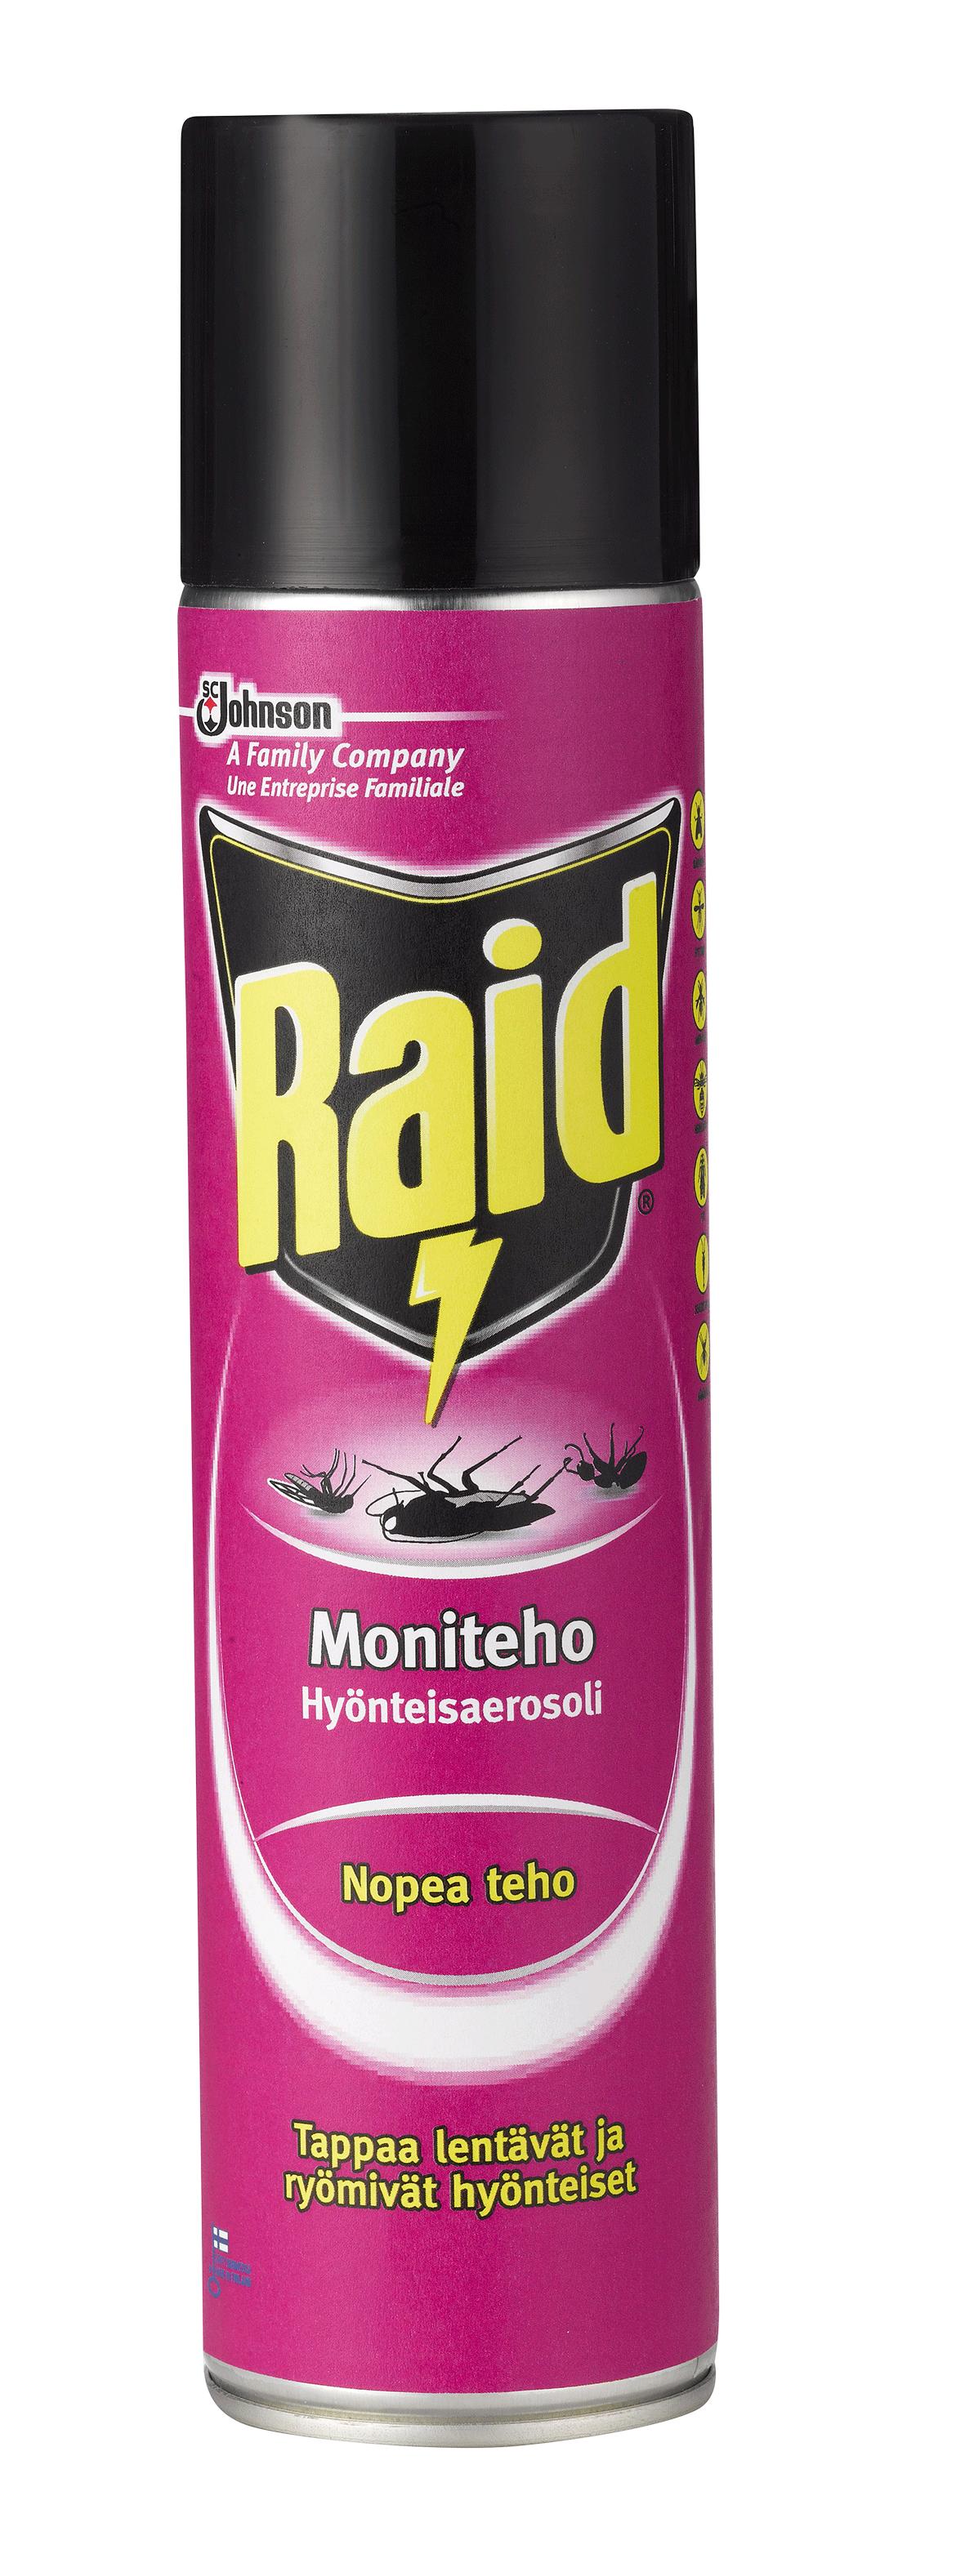 Hyönteiskarkote Raid Moniteho